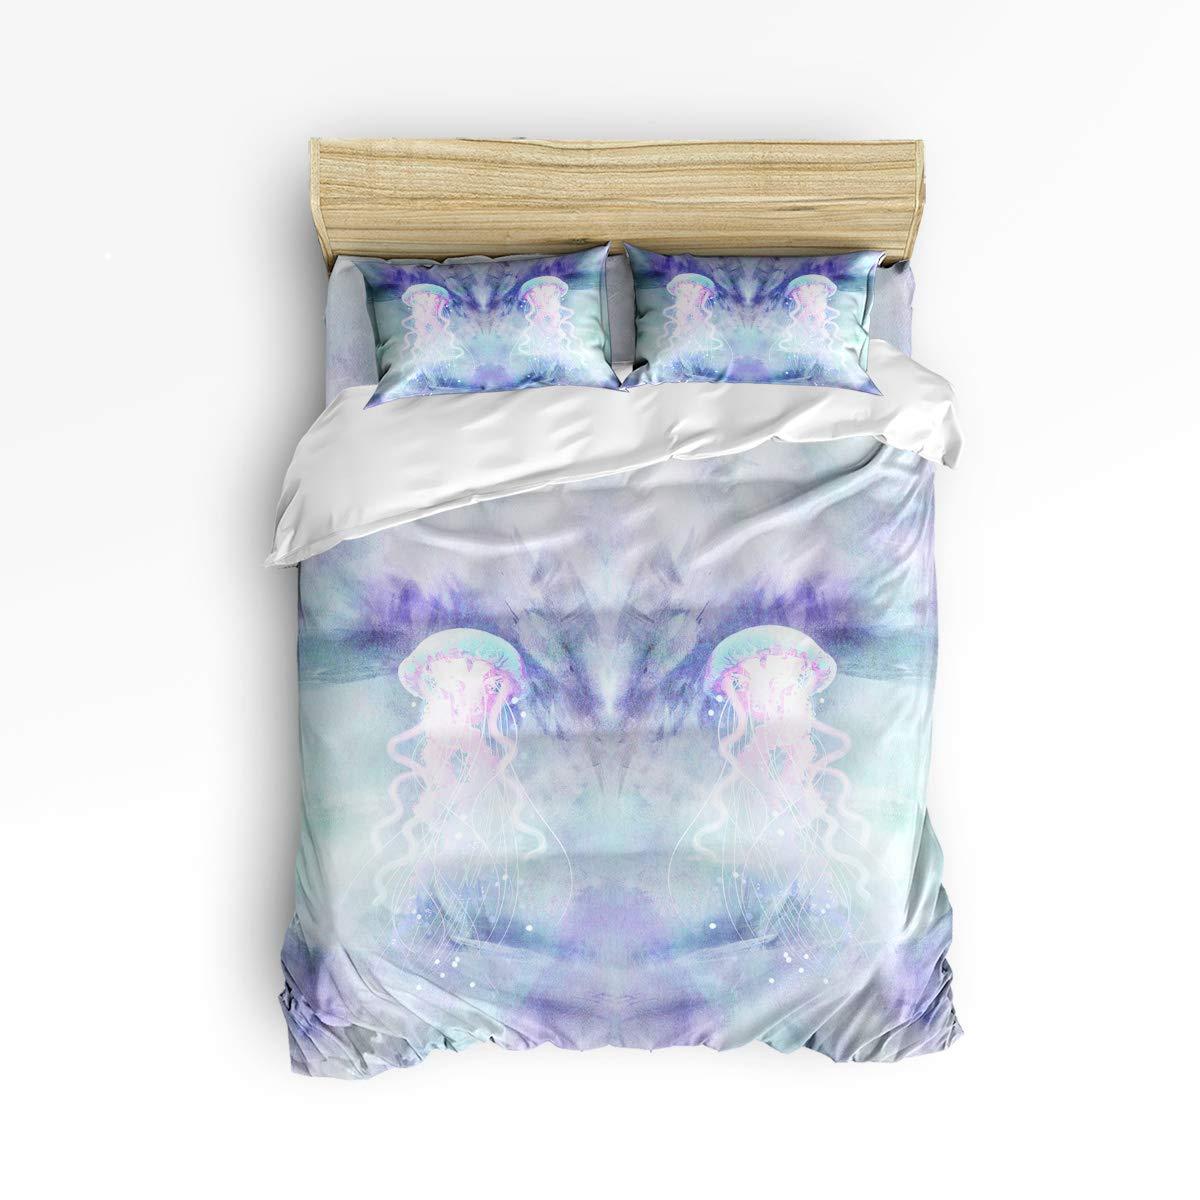 YEHO アートギャラリー キングサイズ 掛け布団カバー4点セット ジッパー付き かわいいソフトベッドシーツセット 美しいクラゲ模様 掛け布団カバー 寝具セット 掛け布団カバー1枚+ベッドシーツ1枚+枕カバー2枚 B07KWCFQ1Y